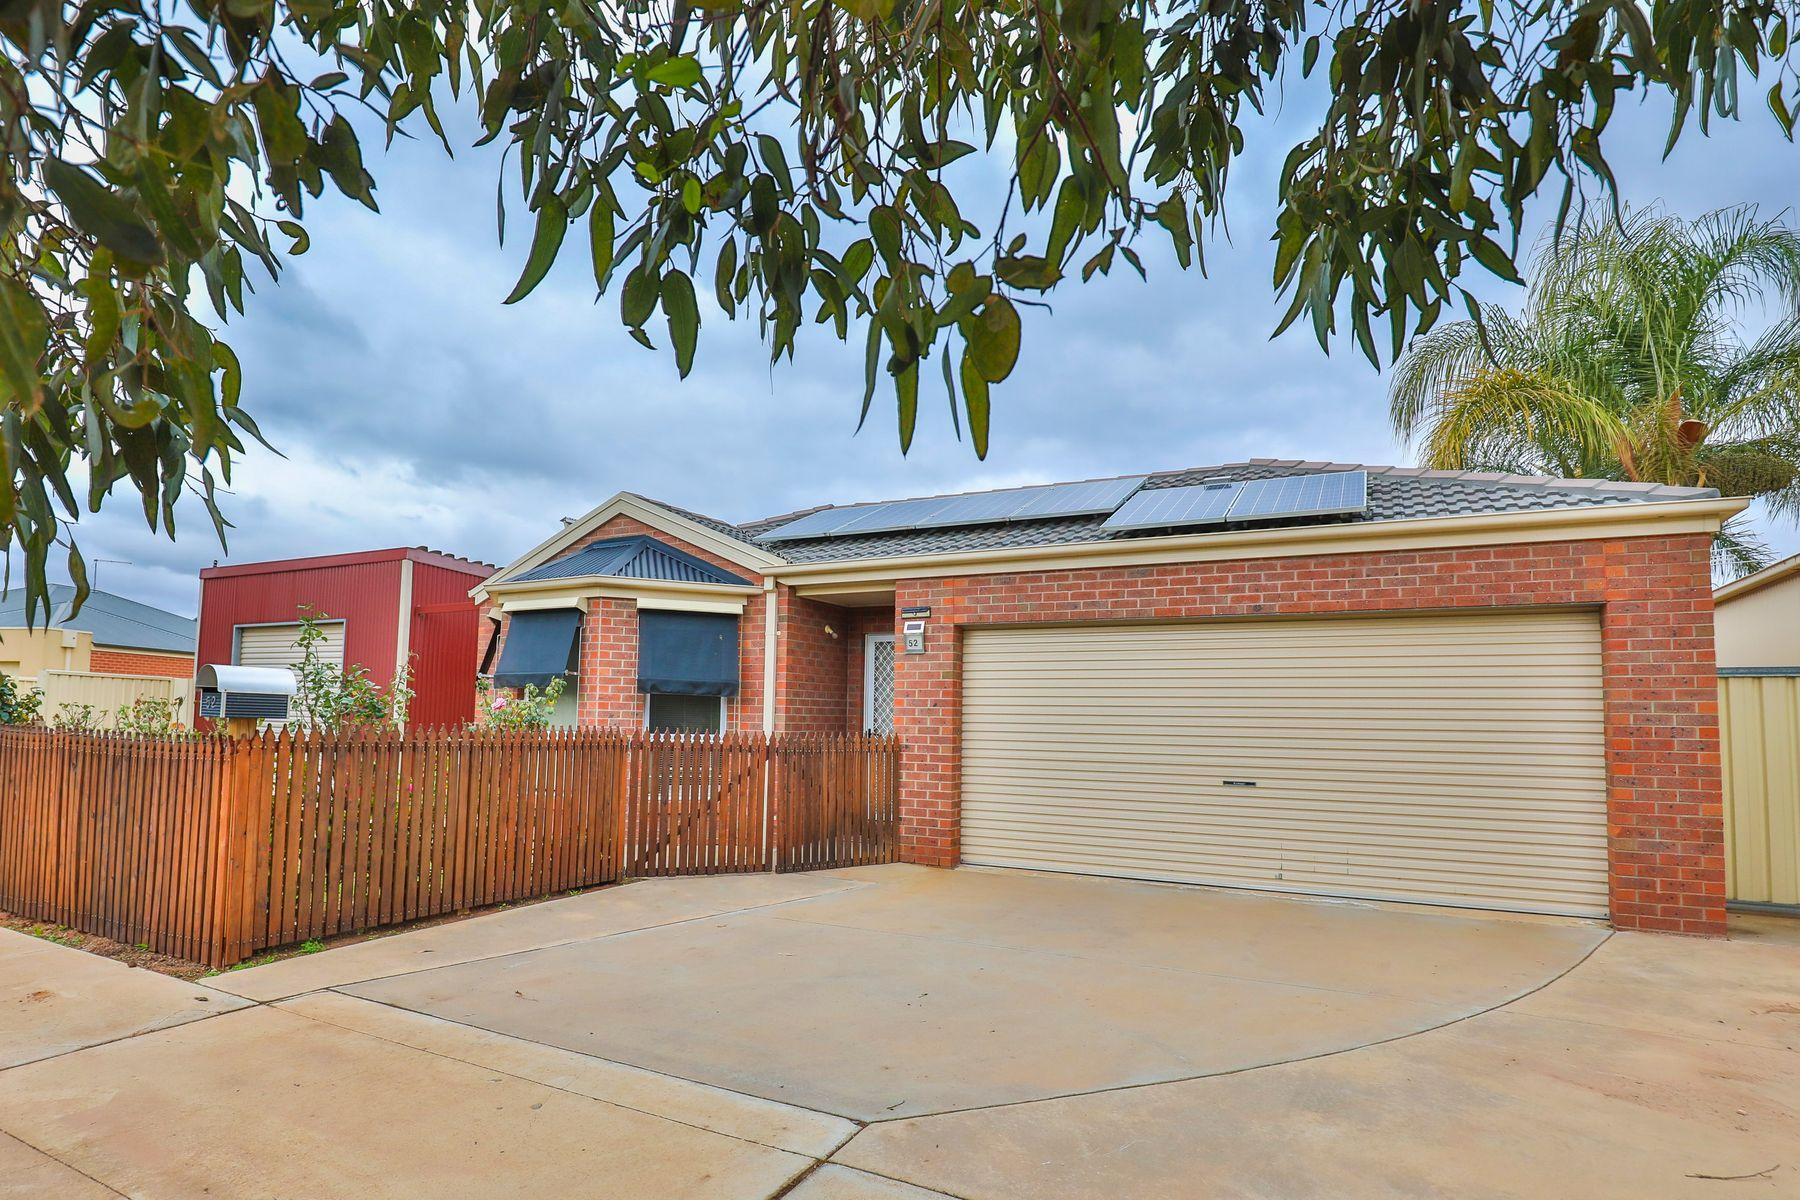 52 Matthew Flinders Drive, Mildura, VIC 3500